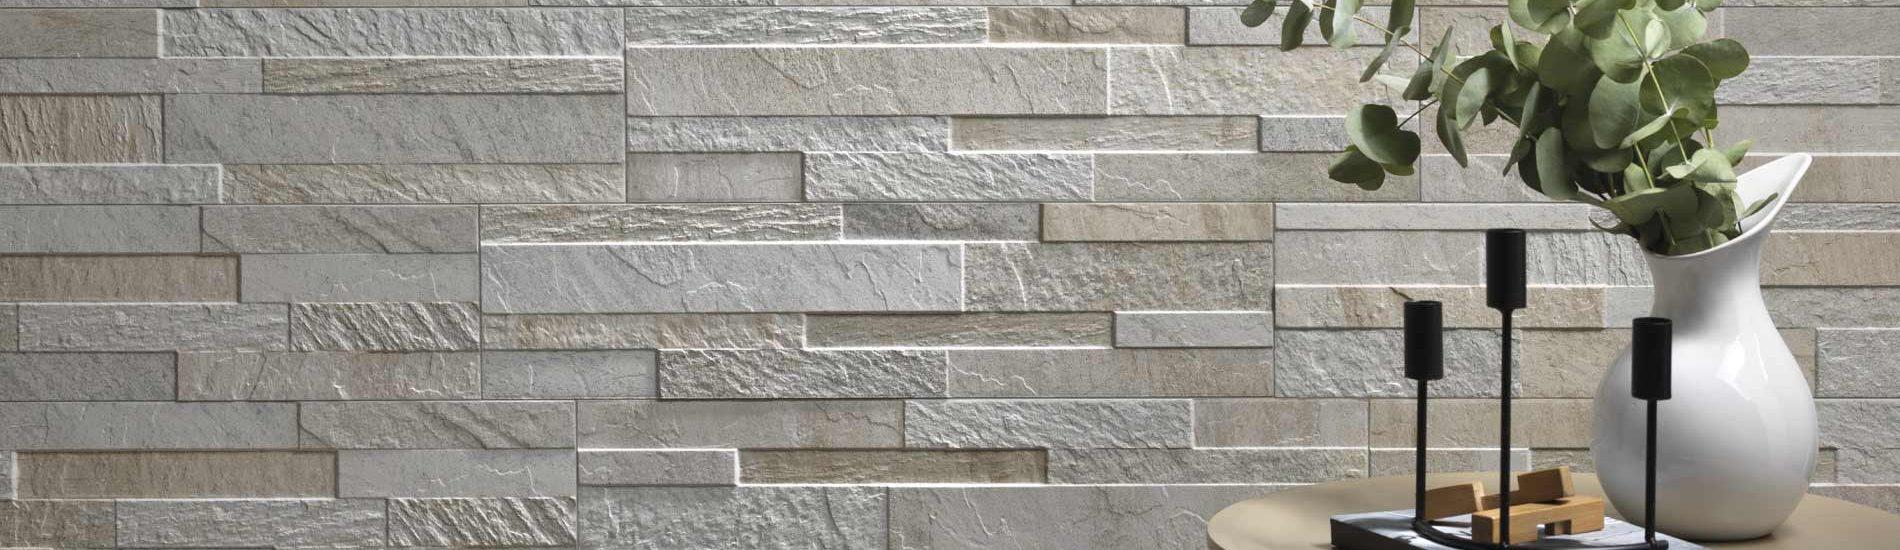 cubics 3d ledger stone look wall tile